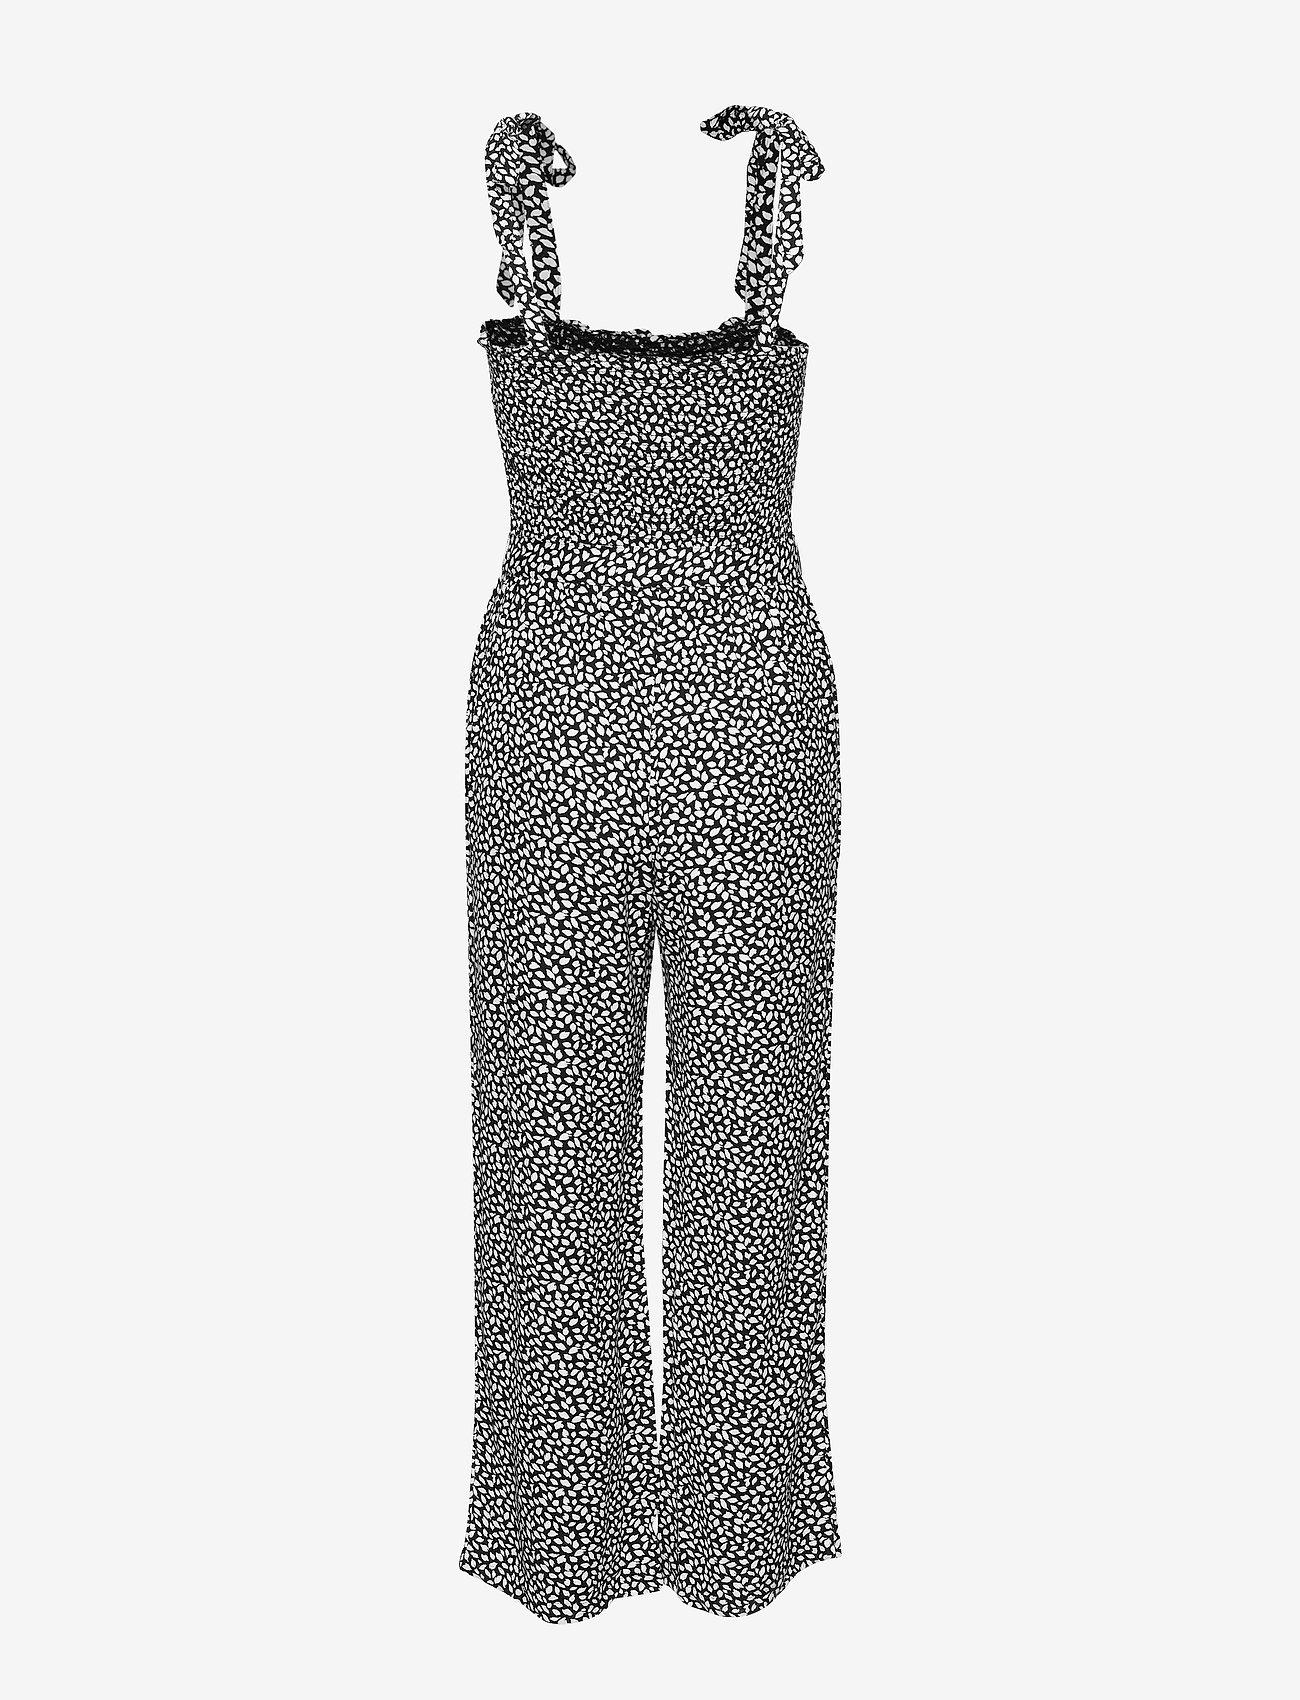 Leaf Smocked Jumpsuit (Black Print) (533.40 kr) - Abercrombie & Fitch